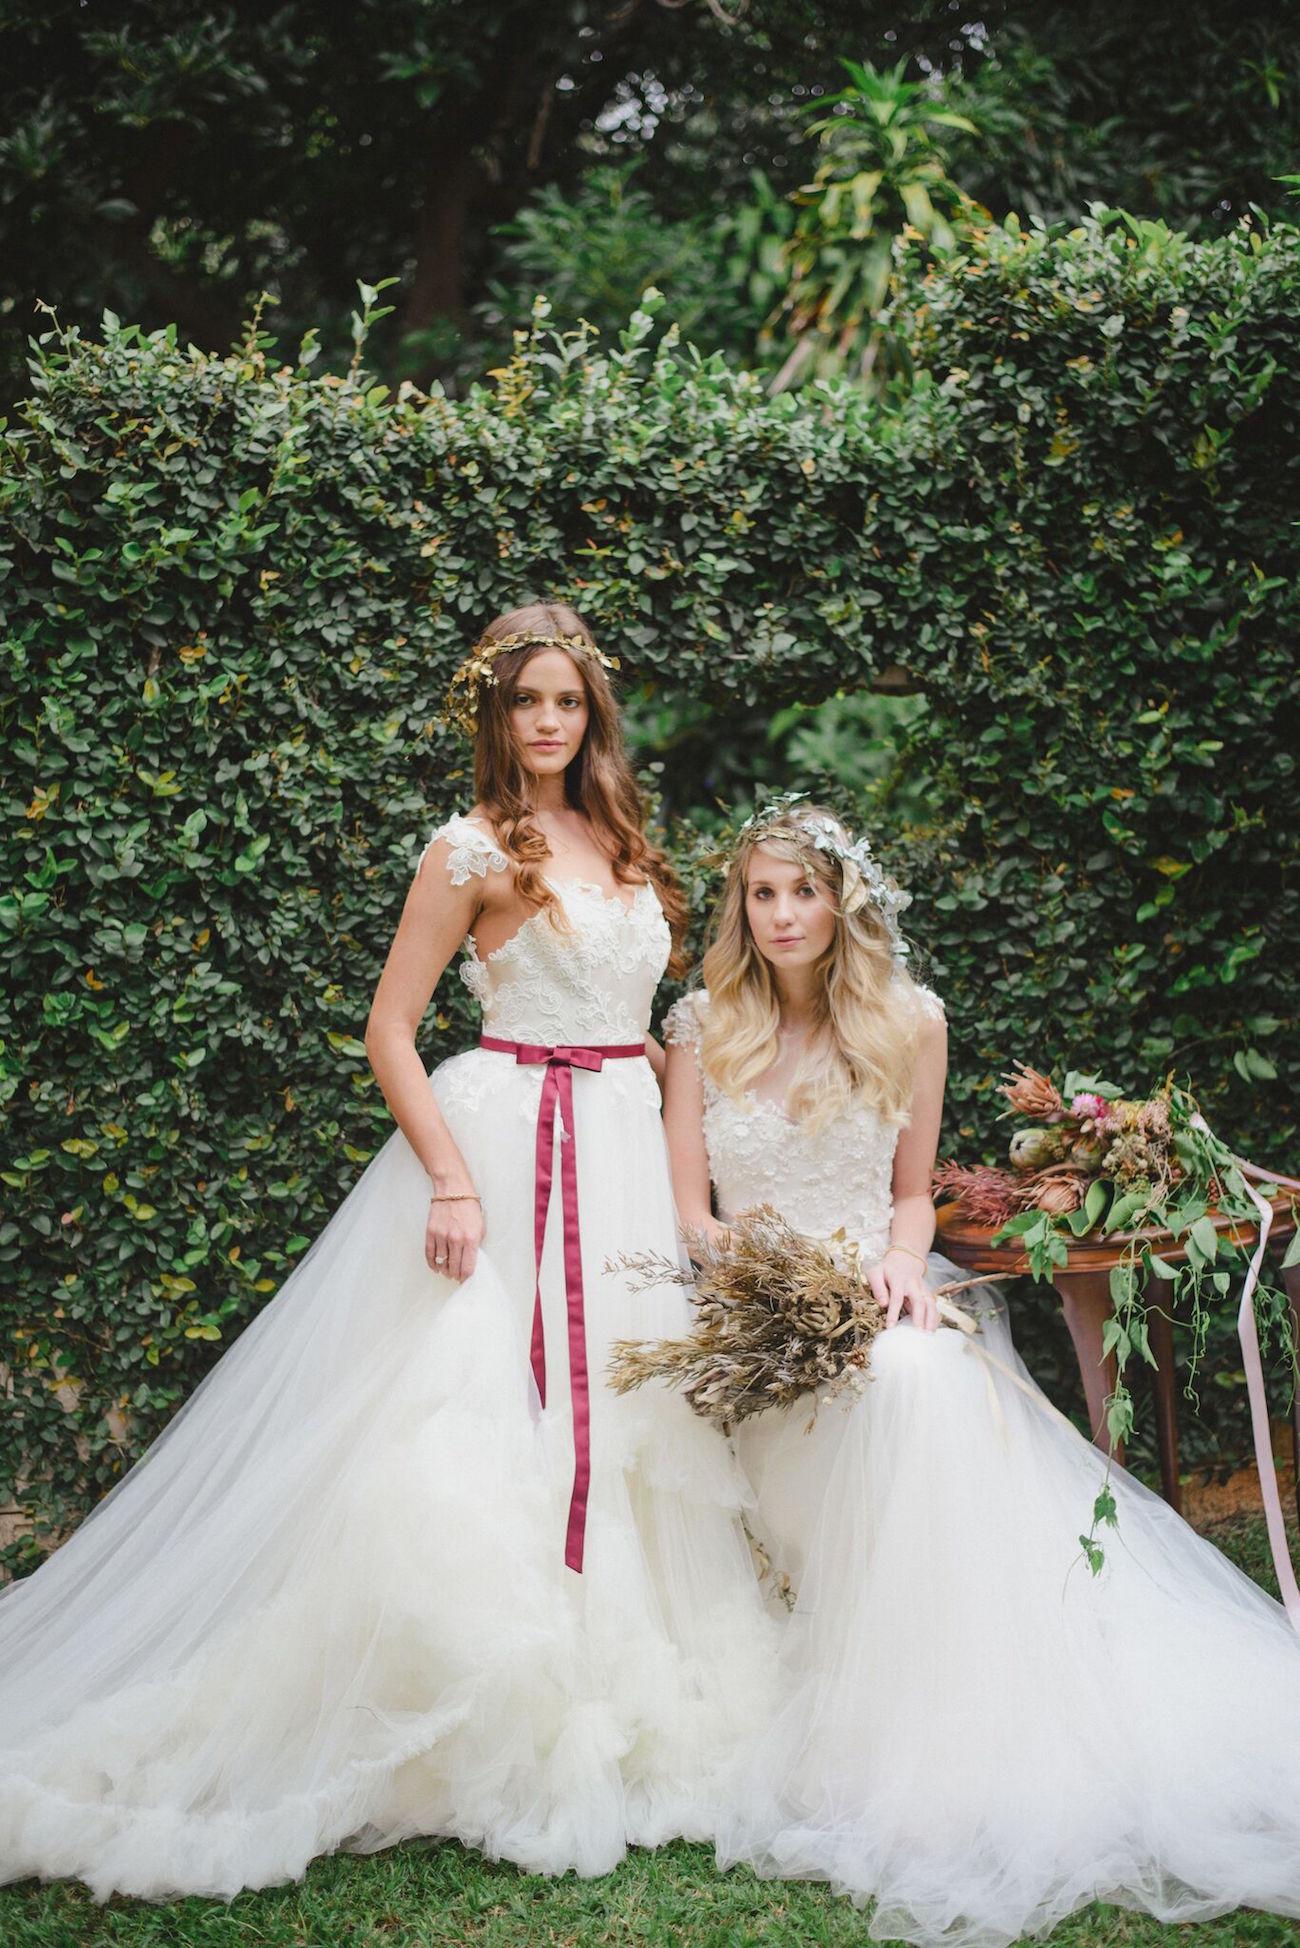 McCarthy Wolff Wedding Dresses | Credit: Oh Happy Day & Roxanne Davison